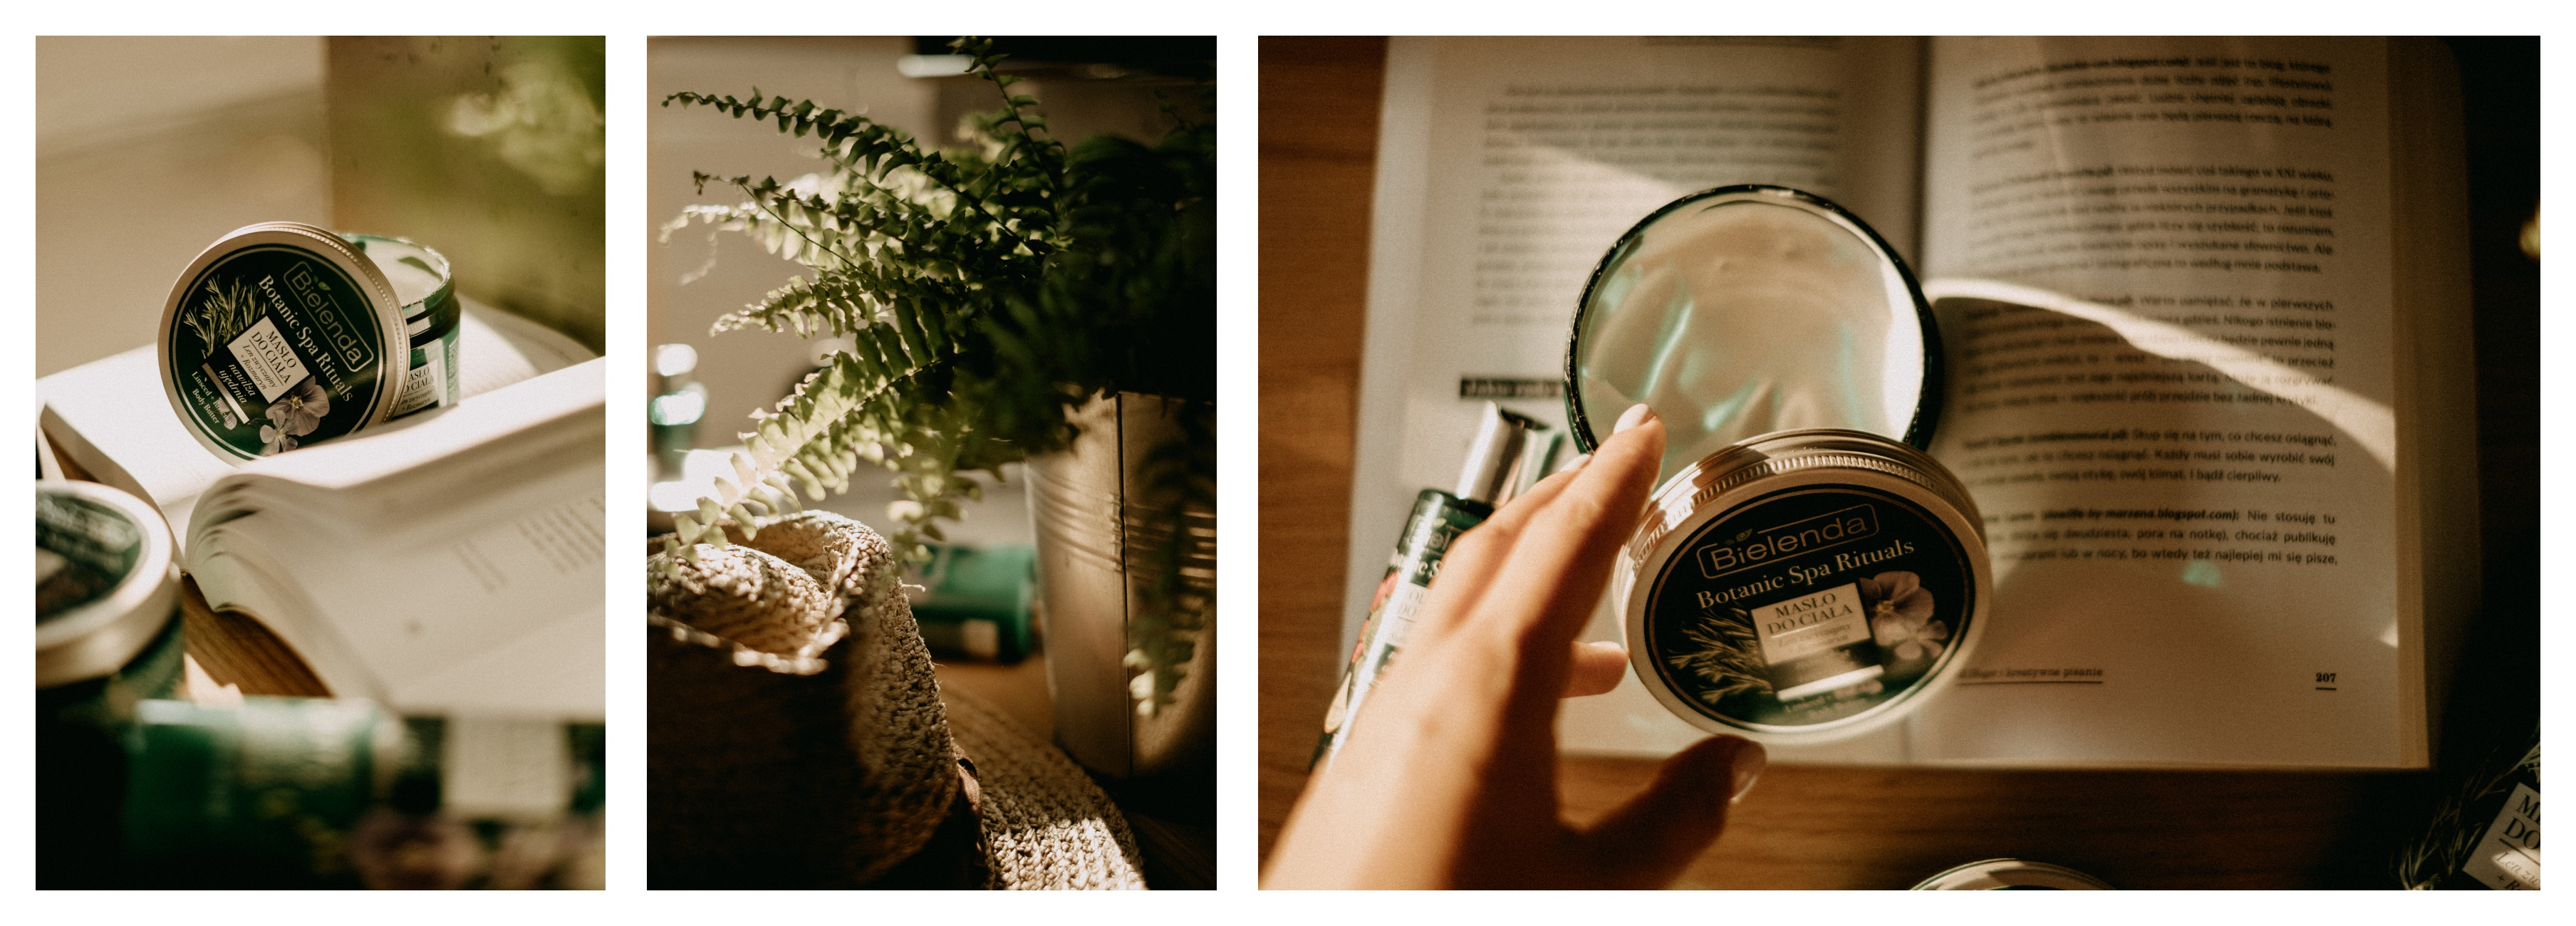 recenzja botanic spa rituals bielenda